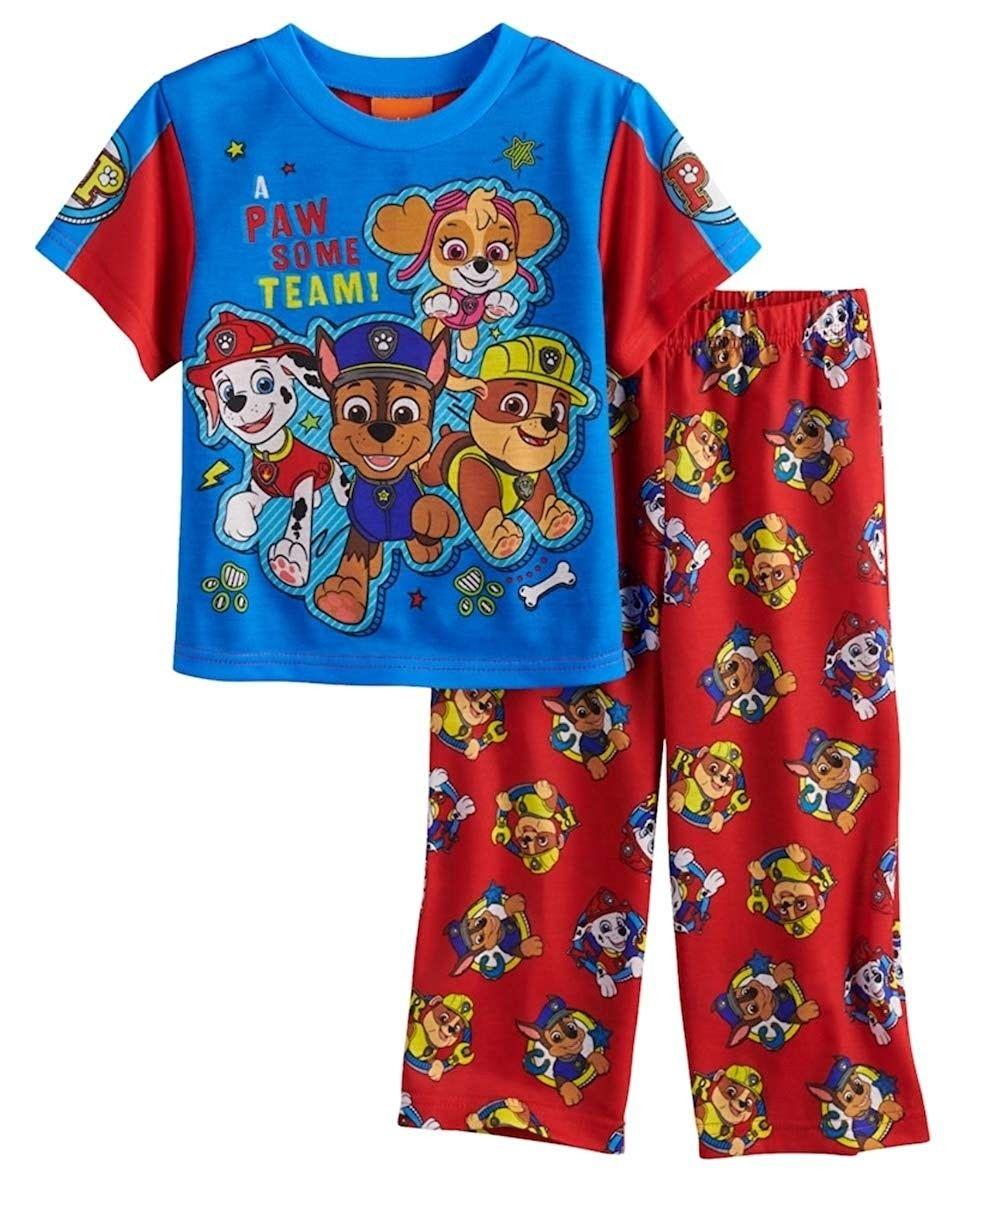 PAW PATROL Boys Chase Marshall and Rubble Pajamas